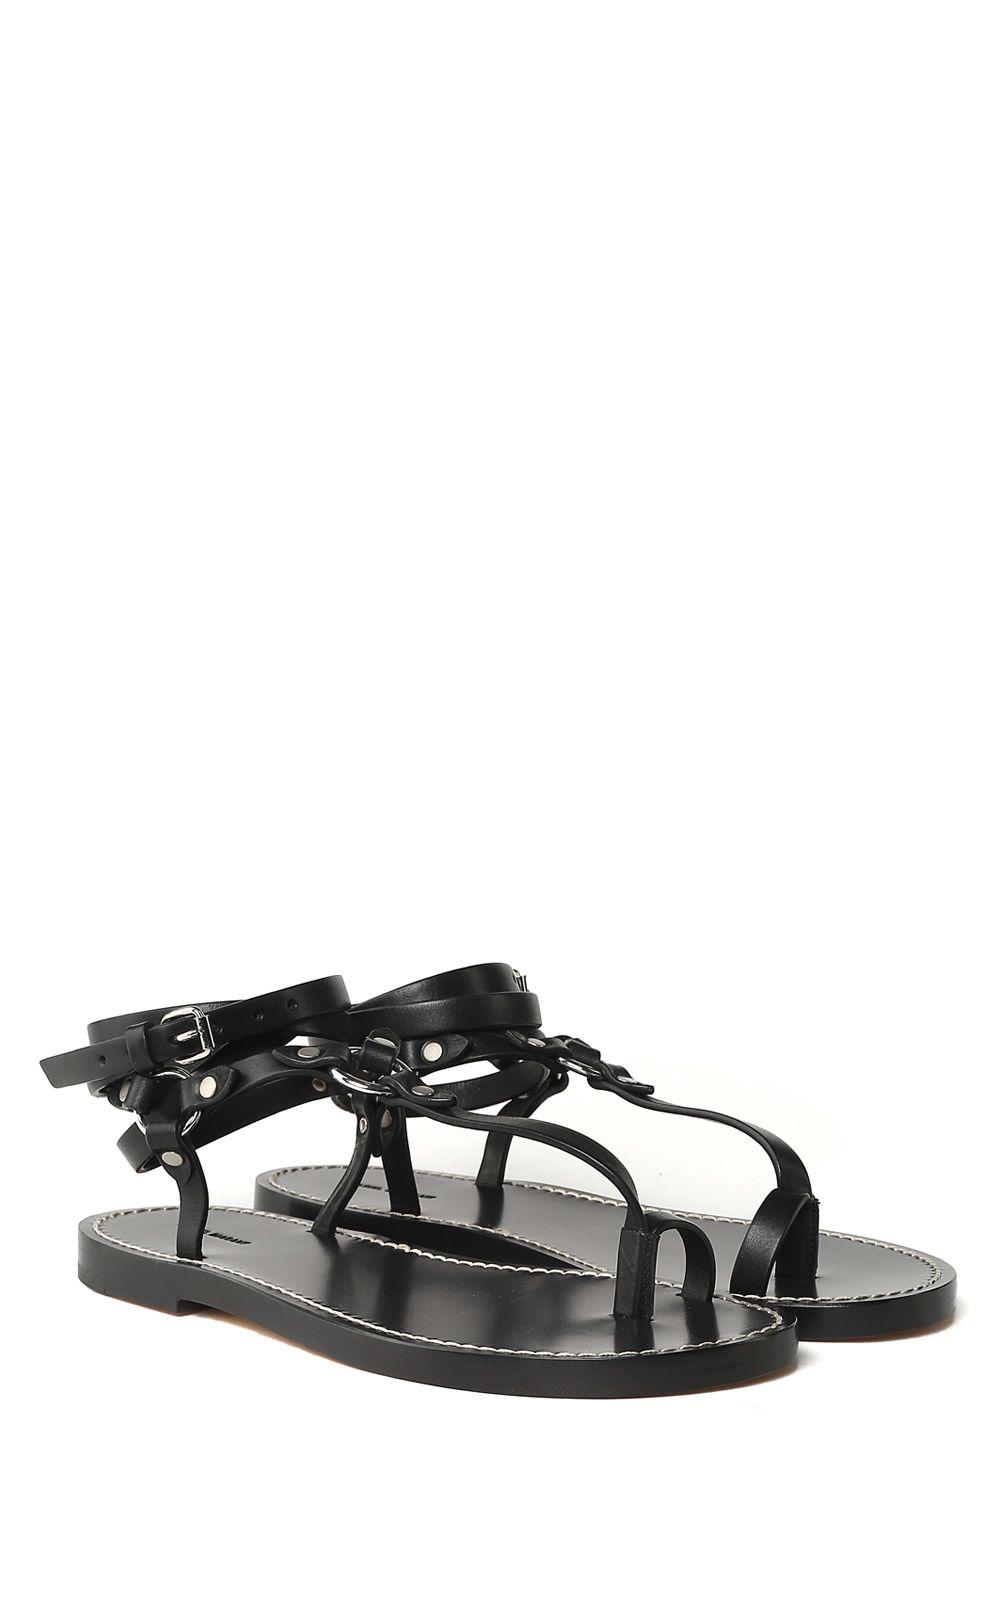 Joxxy toe-post leather sandals Isabel Marant